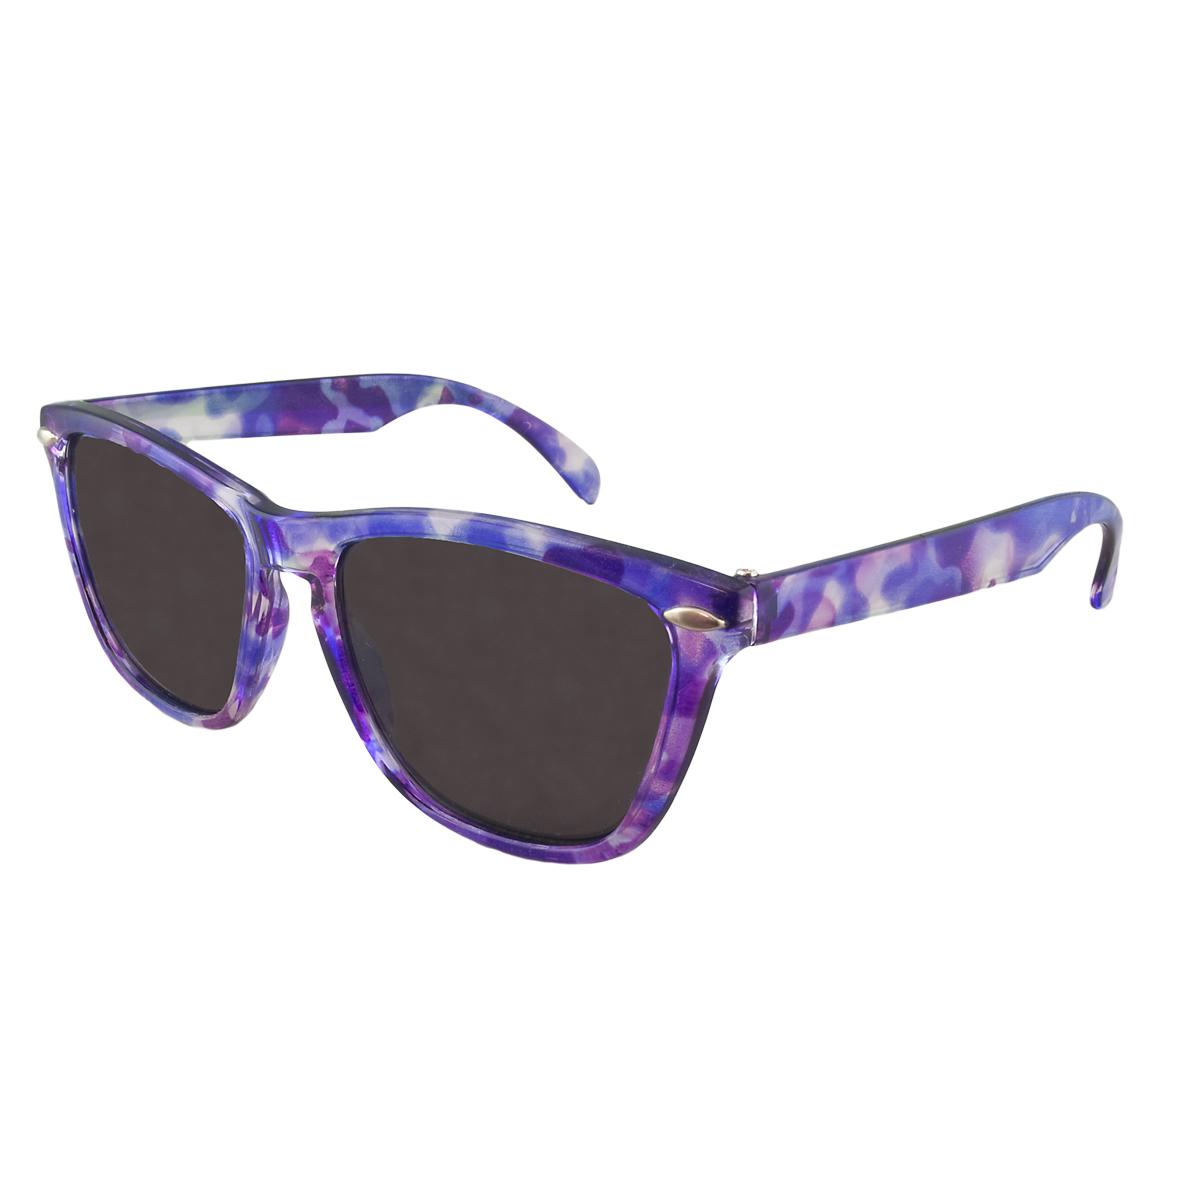 Junior Banz Flyer Sunglasses (Purple Tortoiseshell) image